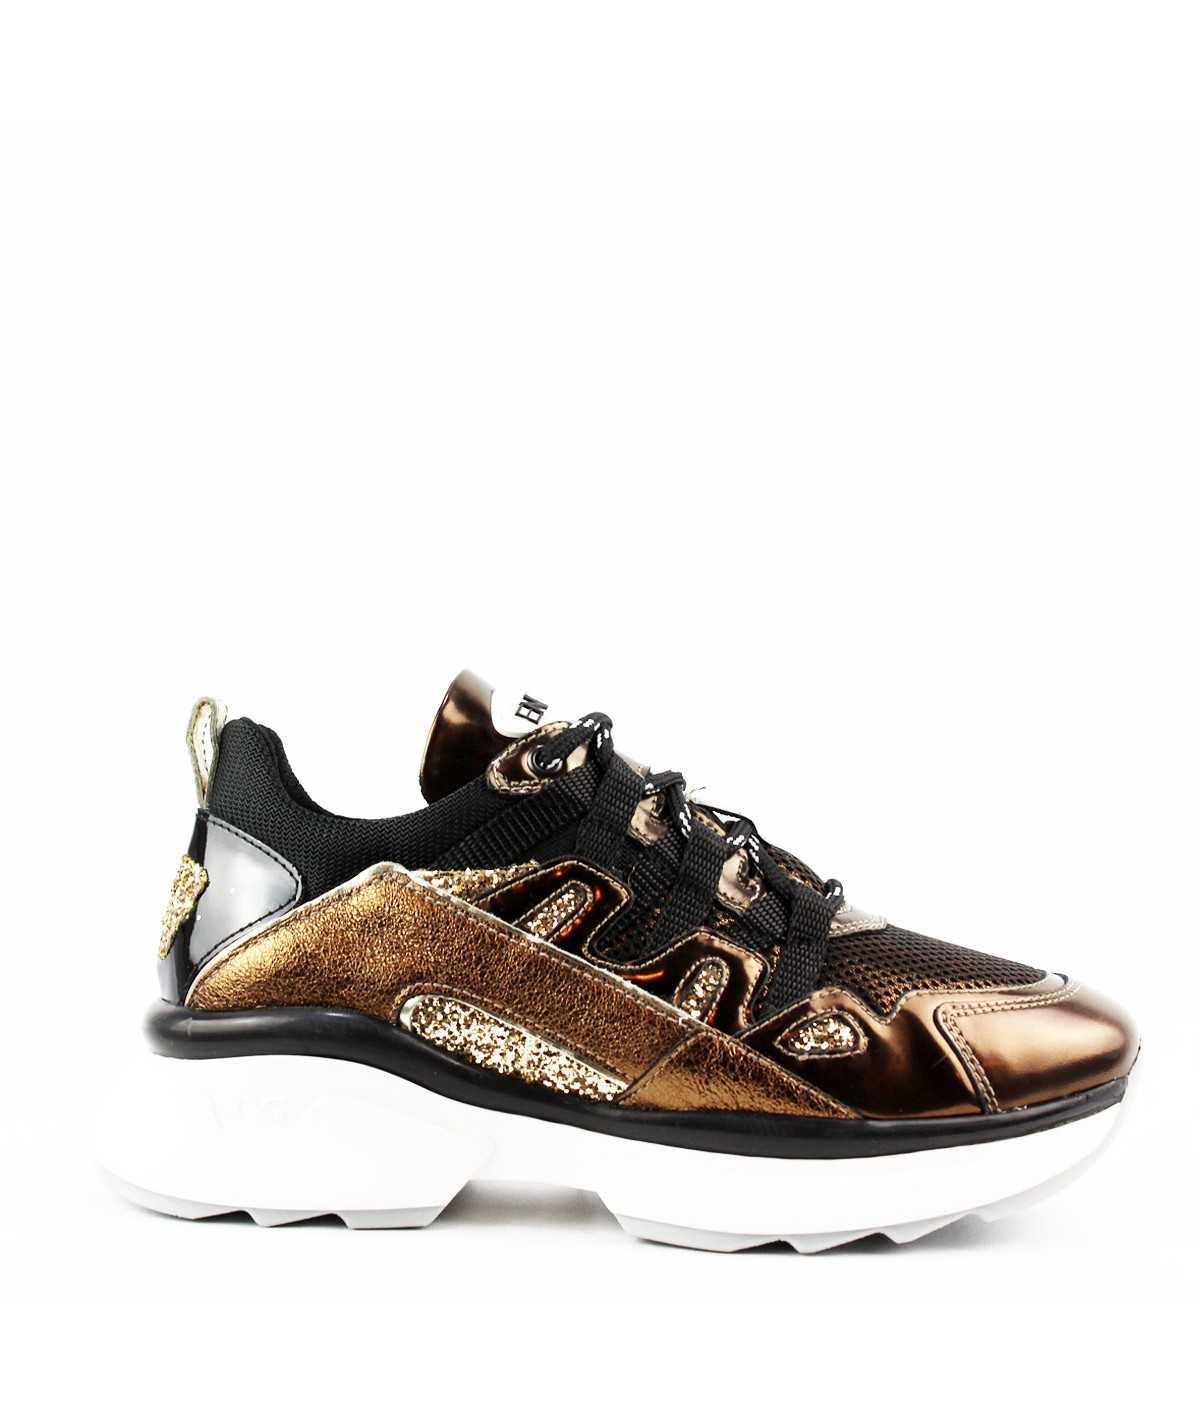 NG NEROGIARDINI Sneakers